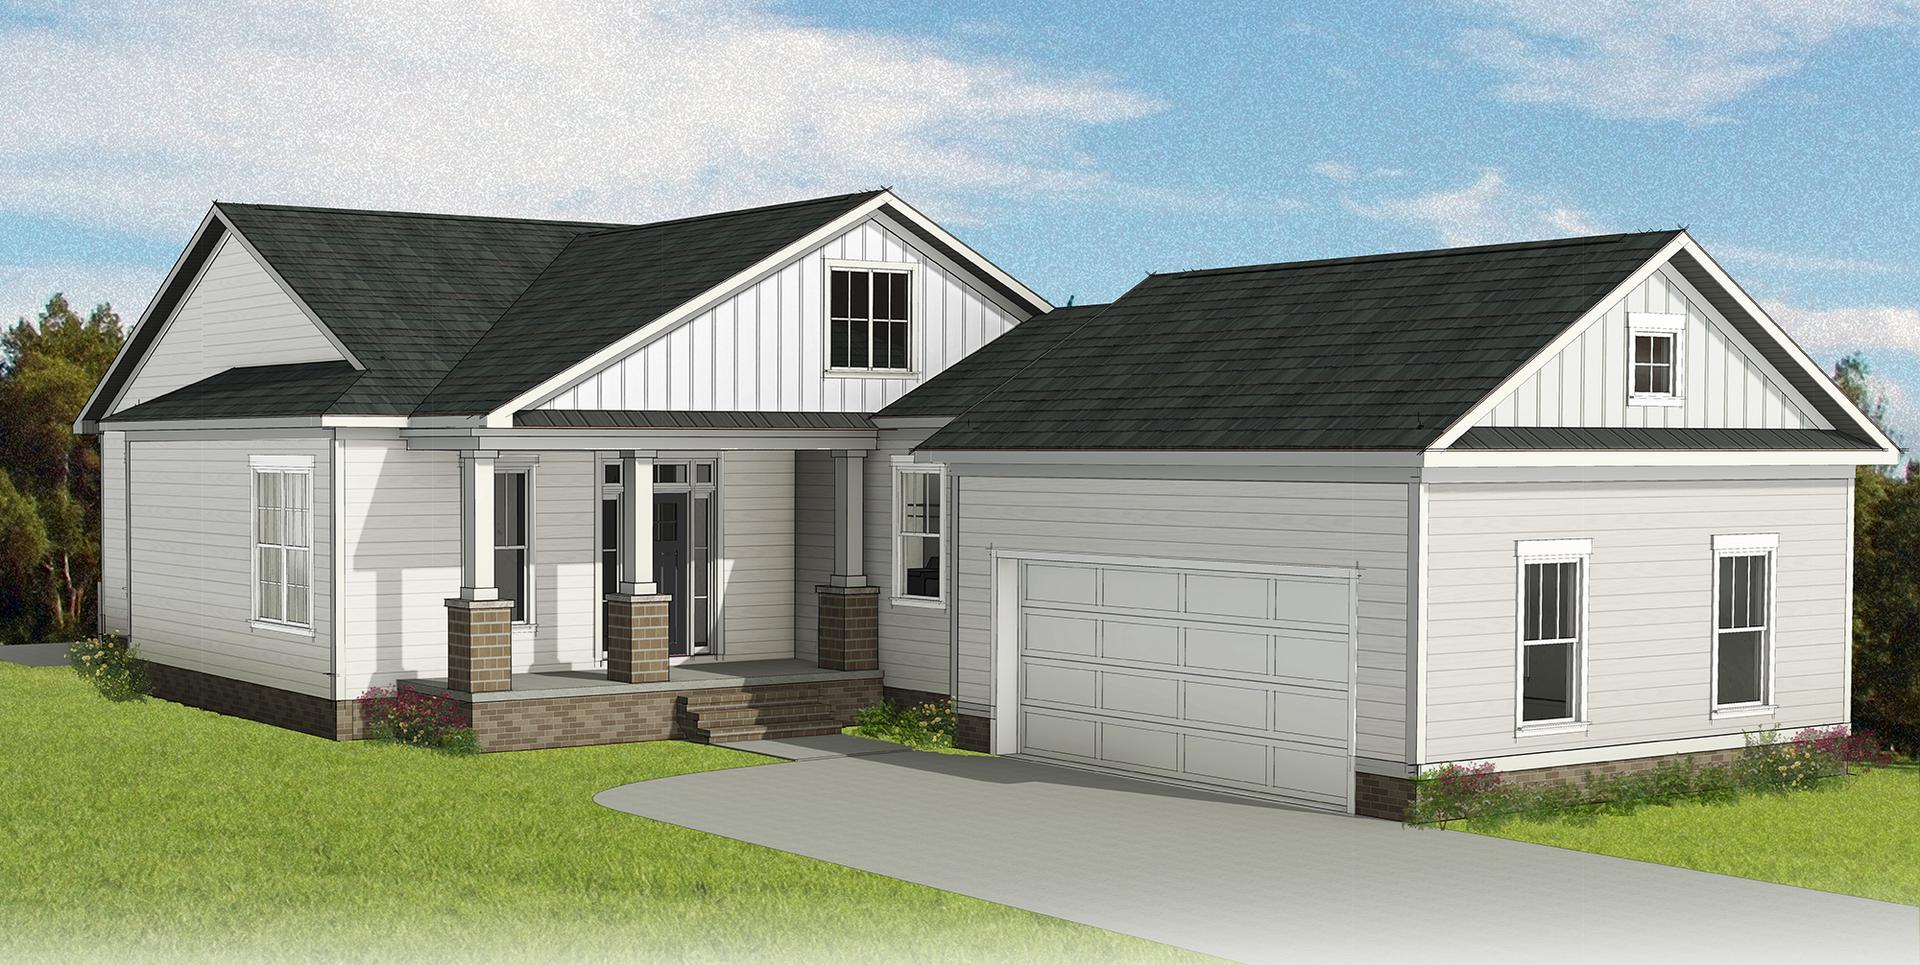 The Easton new home in Smithfield VA